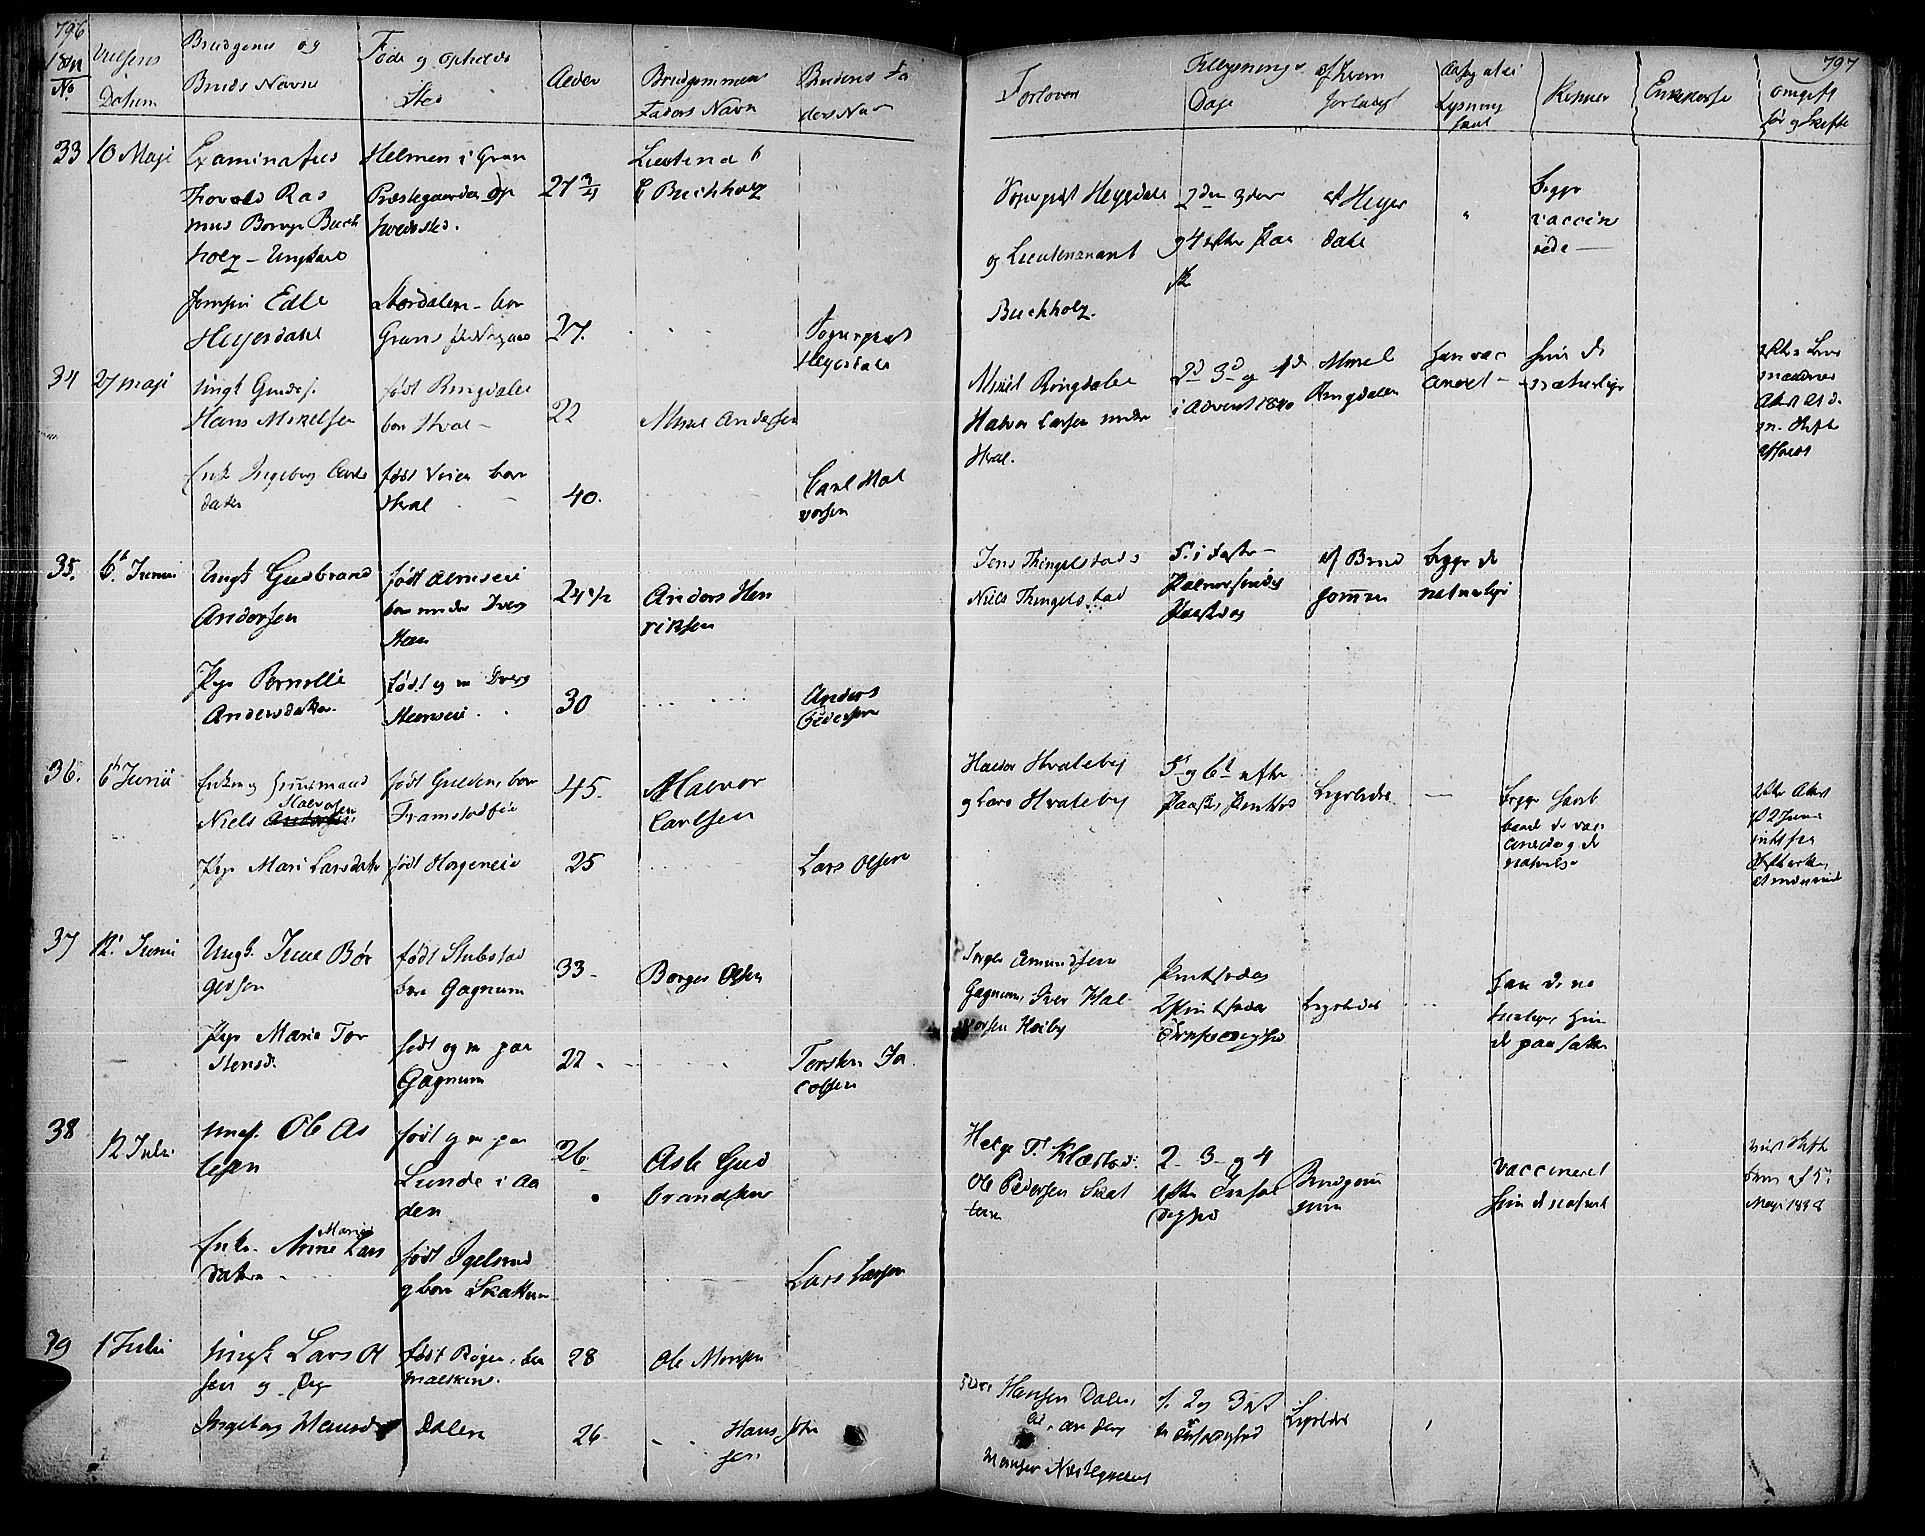 SAH, Gran prestekontor, Ministerialbok nr. 10, 1824-1842, s. 796-797